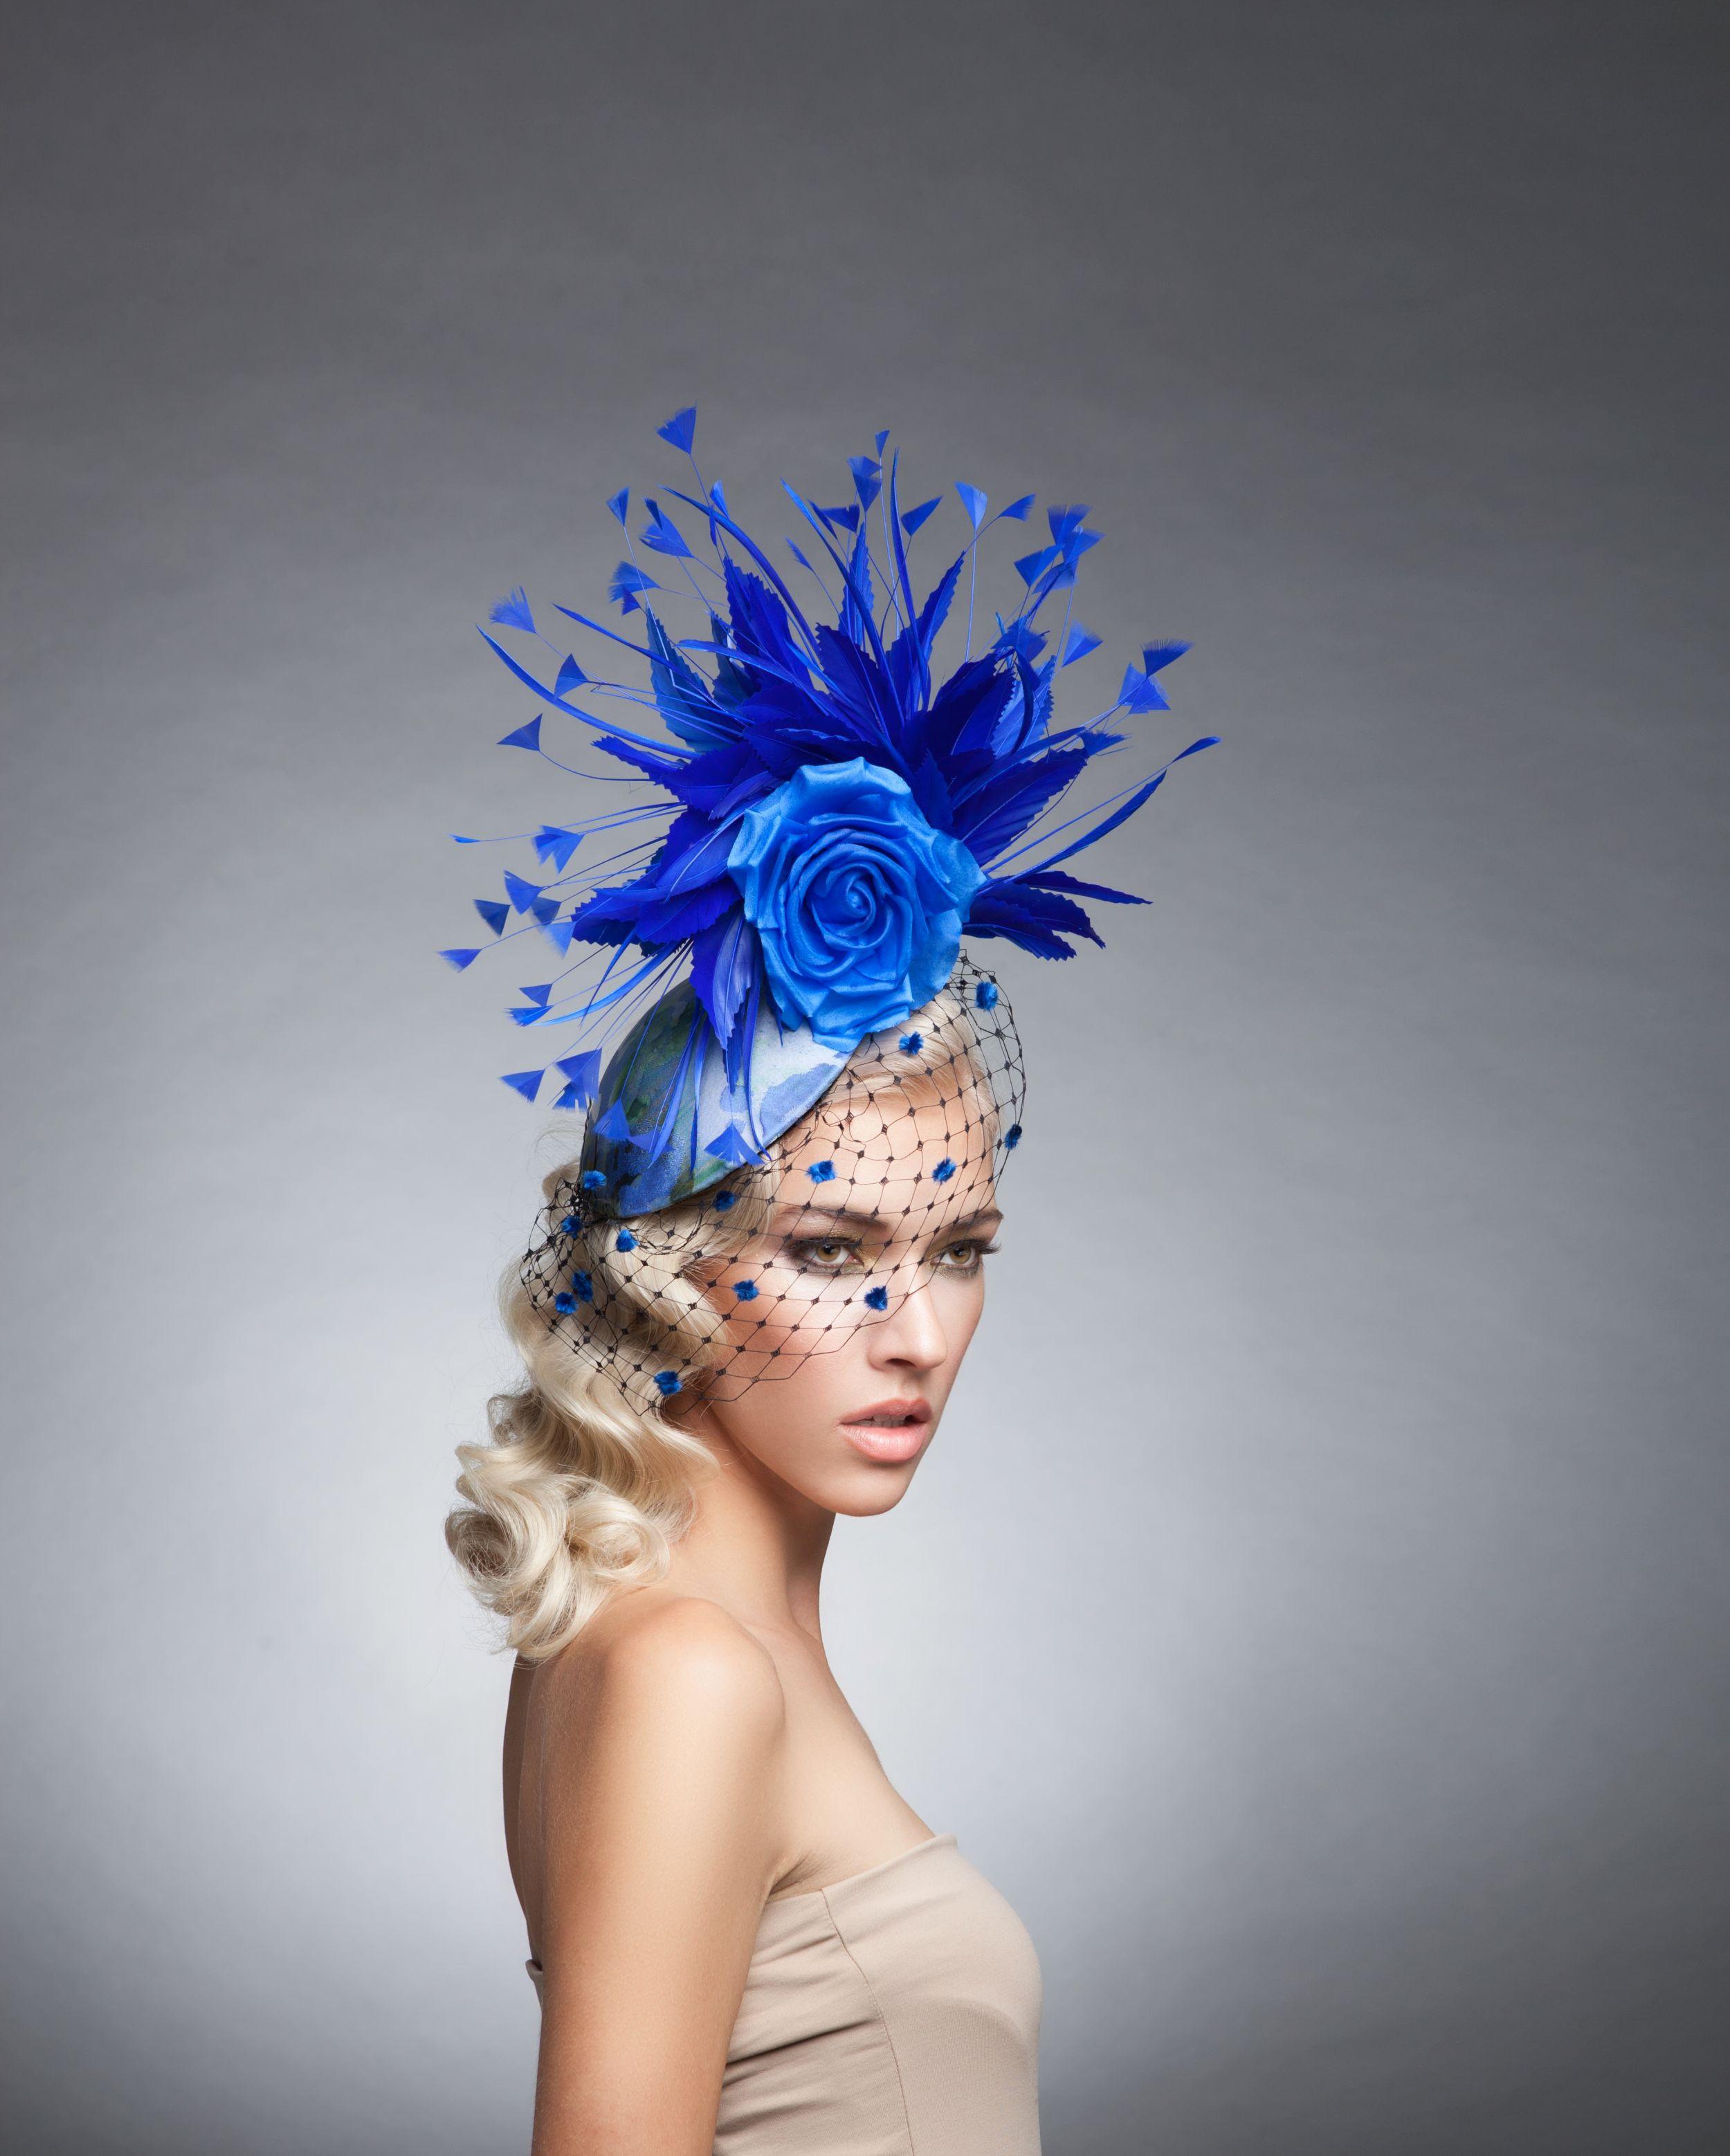 Hat designer: Arturo Rios  Photographer: Mark Sacro  Model: Stefanie Michova  Makeup: Teodoro De Jesus  Hair: Tuyen Tran